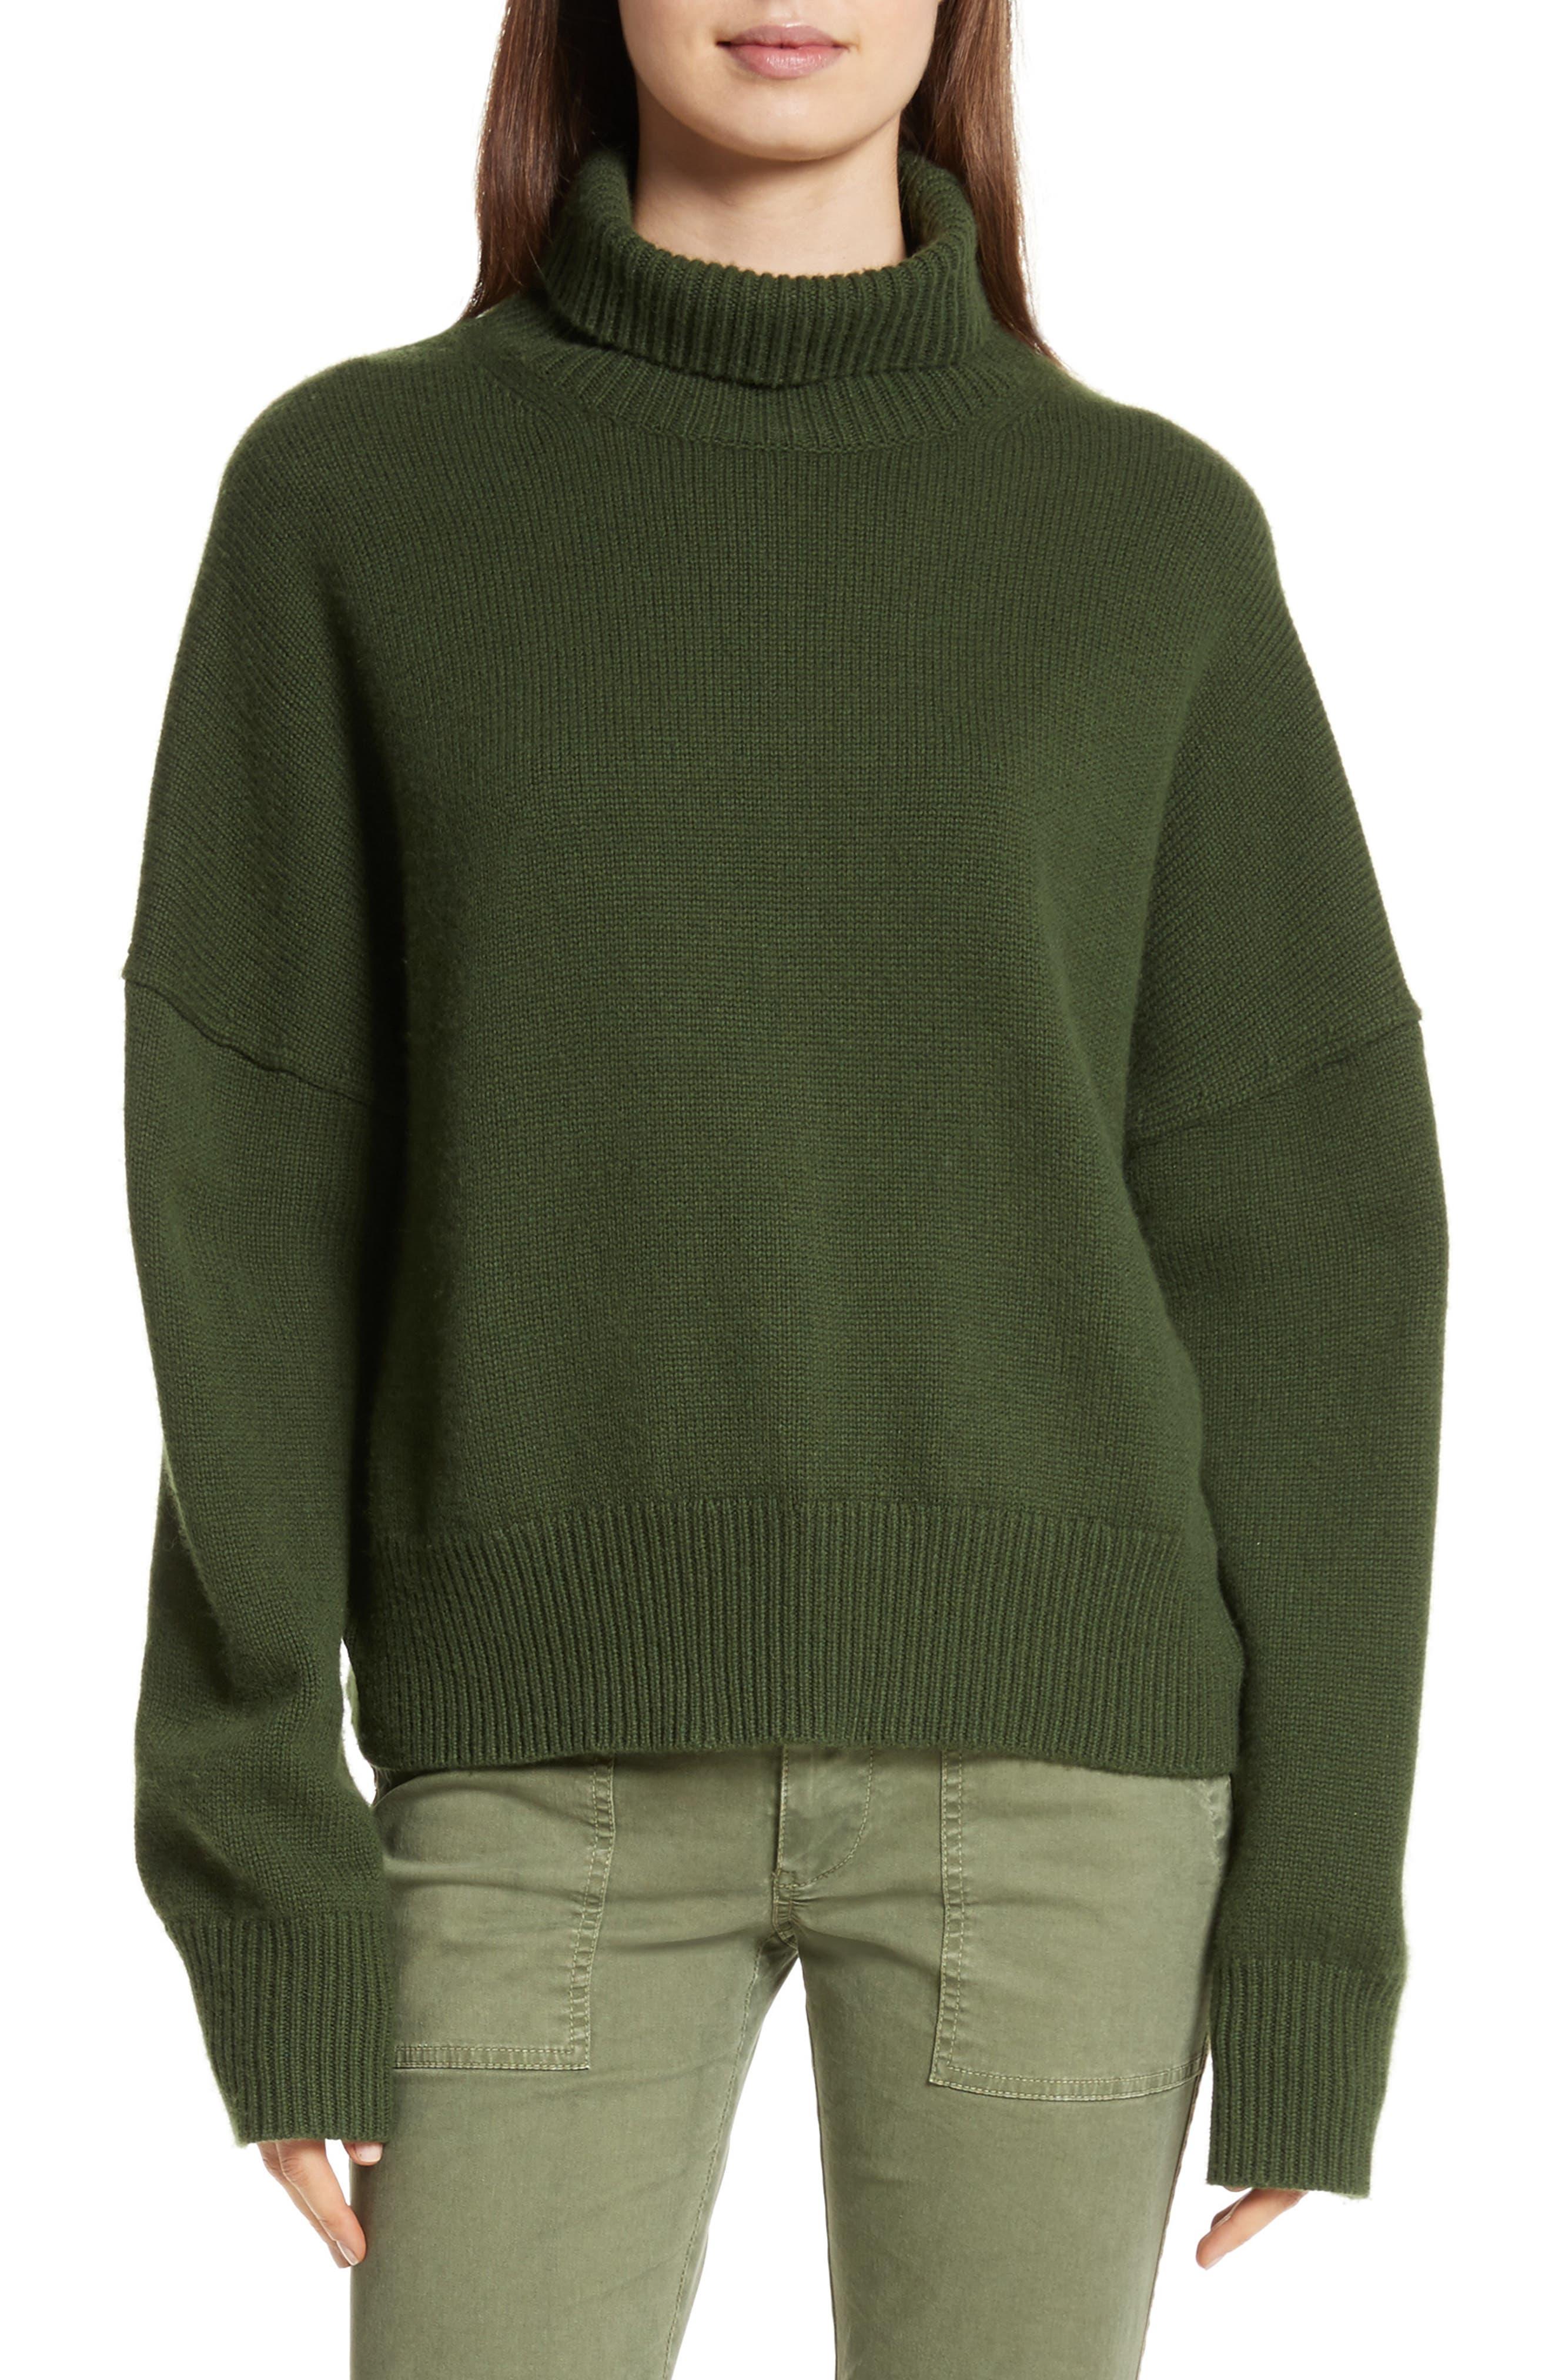 Serinda Wool & Cashmere Turtleneck Sweater,                             Main thumbnail 1, color,                             303